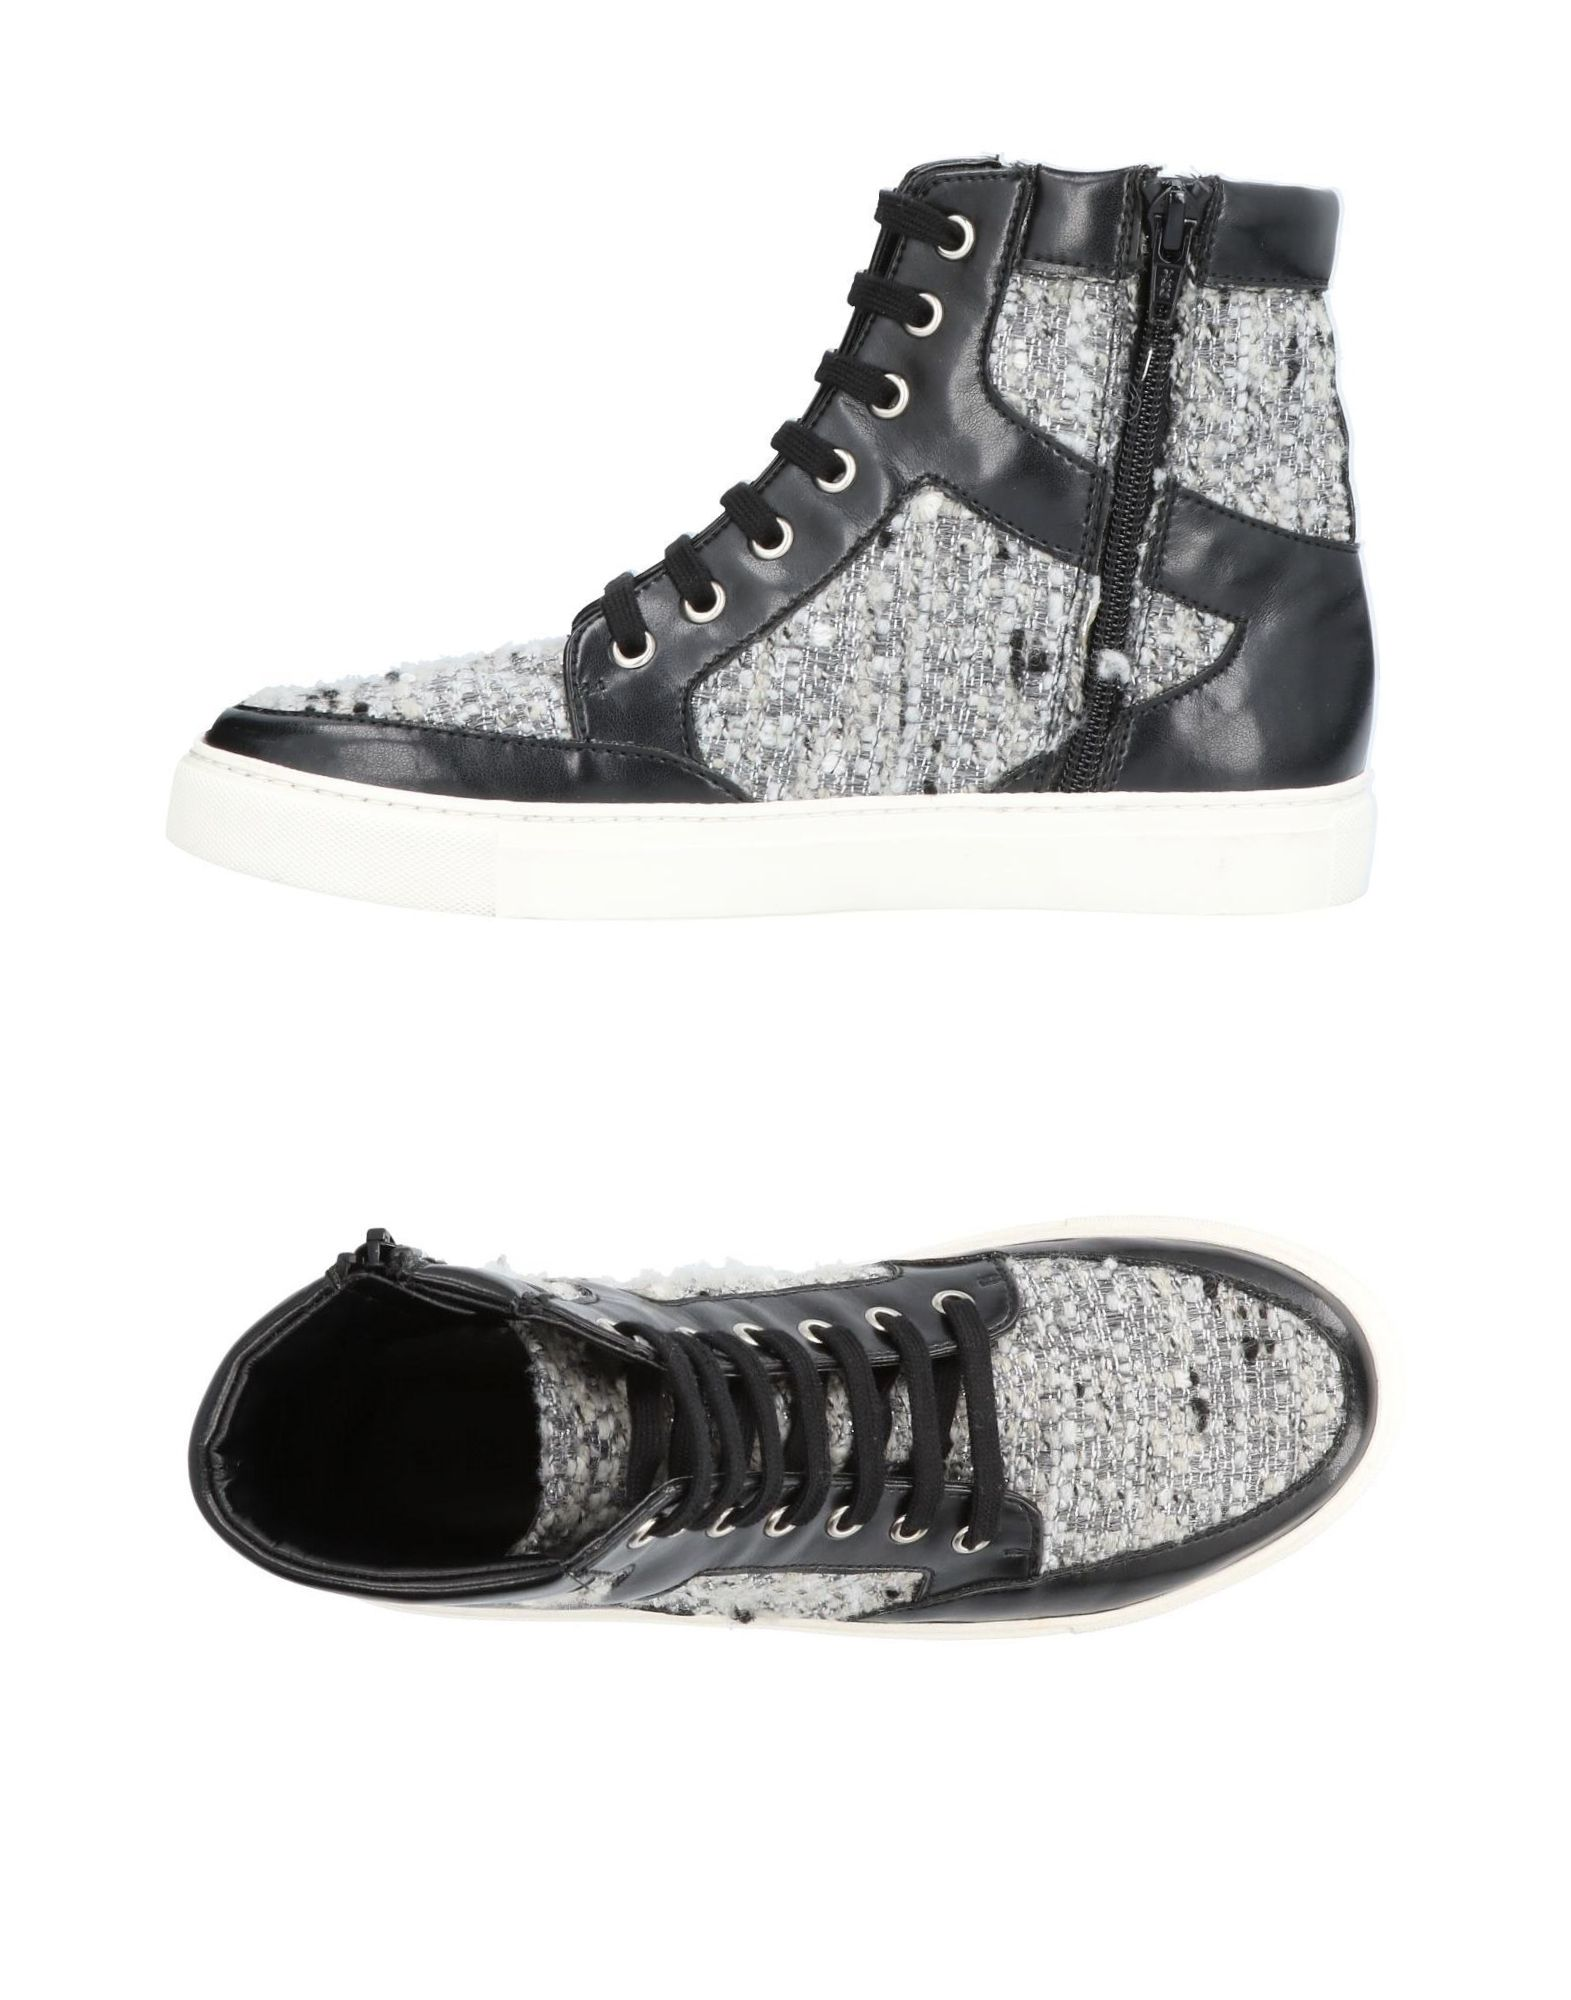 Фото - THE NO ANIMAL BRAND Высокие кеды и кроссовки женские кеды the chinese brand zapato x6